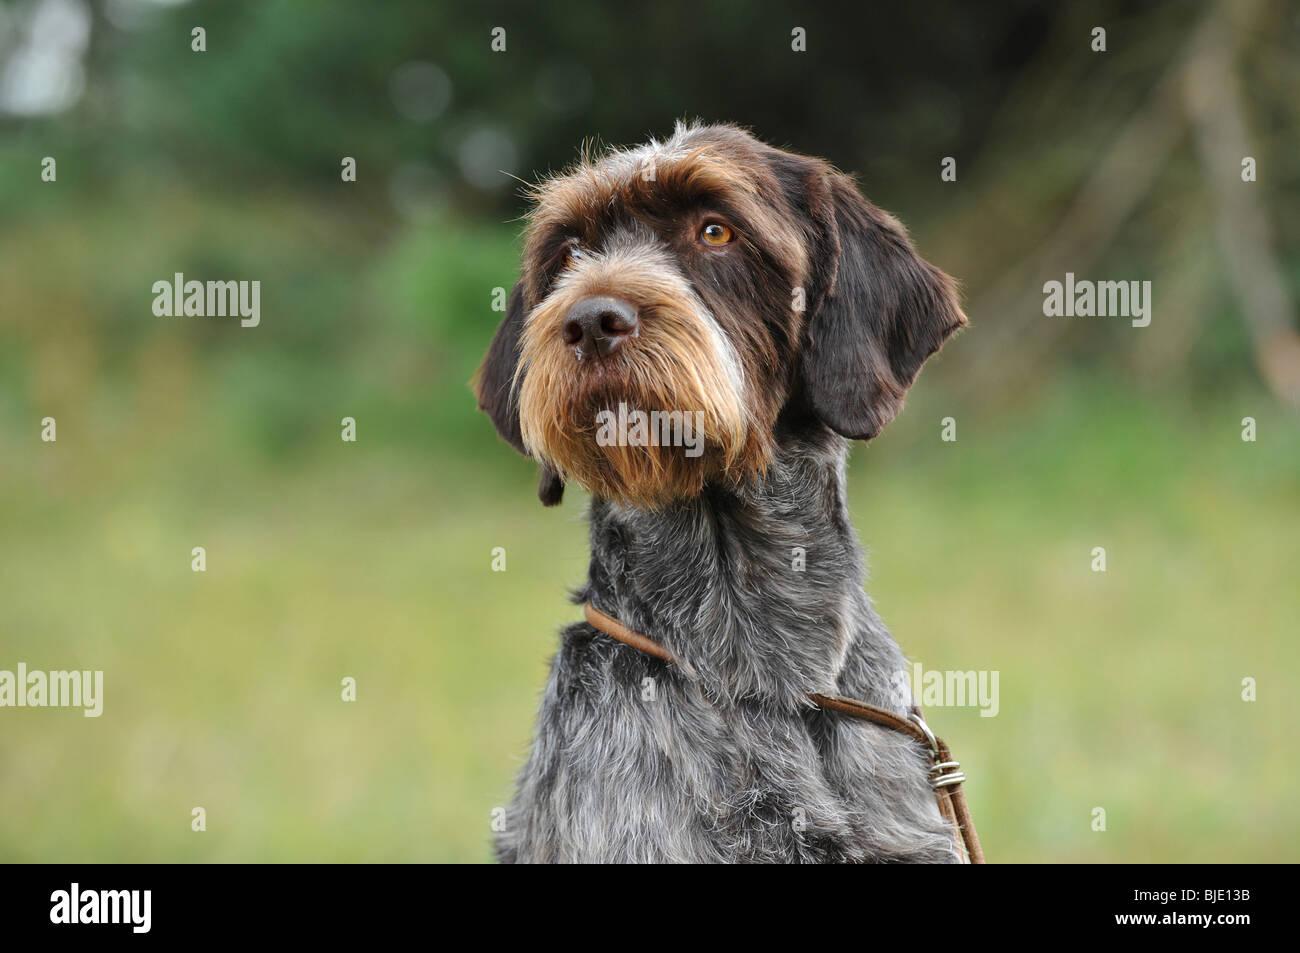 Cesky fousek dog portrait - Stock Image